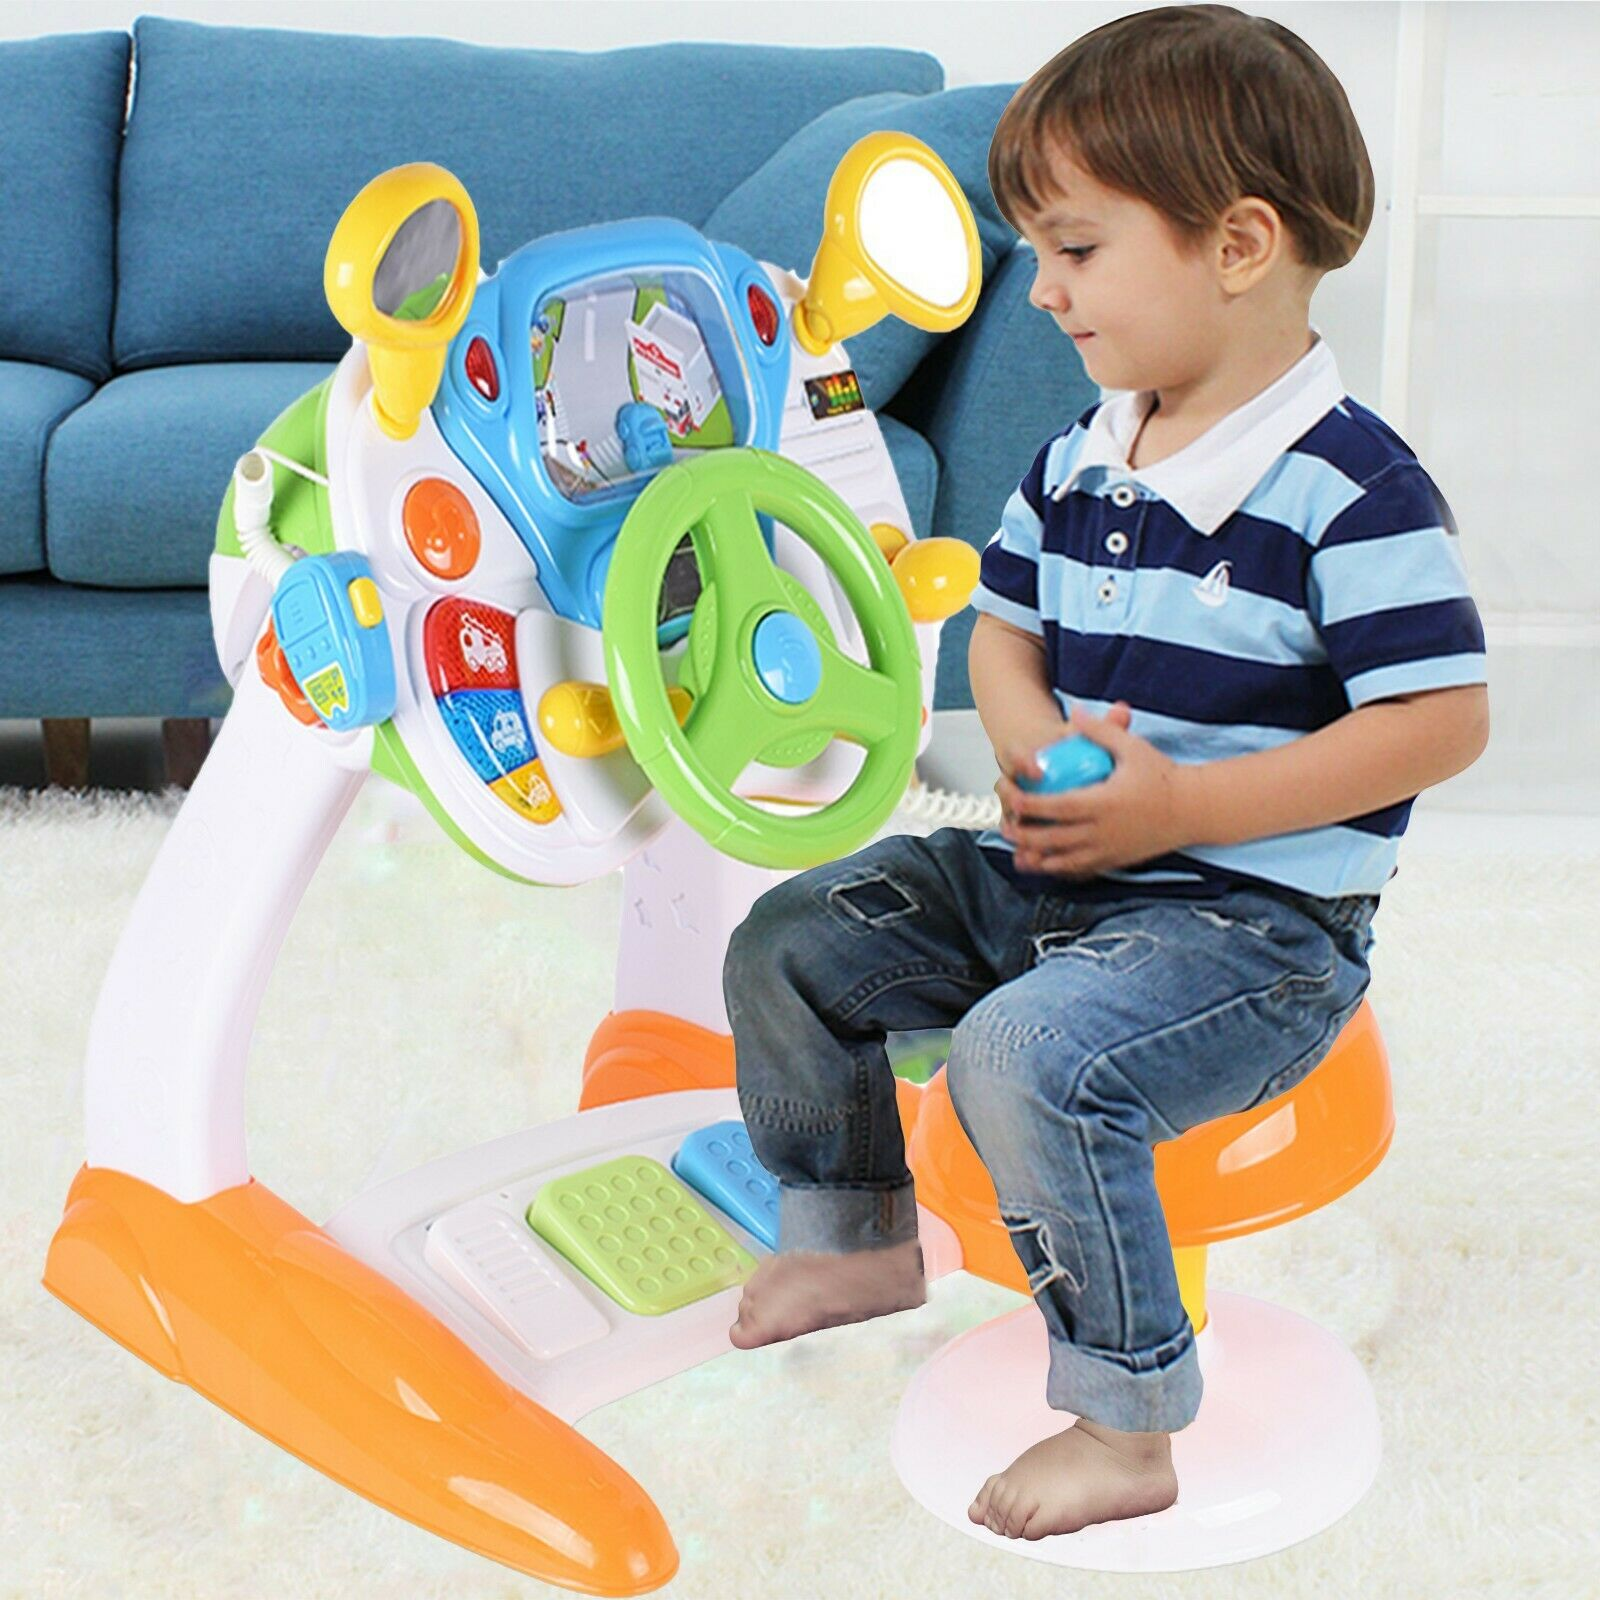 Kinder Elektronische Lenkrad Simulation Car Fahren Activity Spielzeug Petroleum